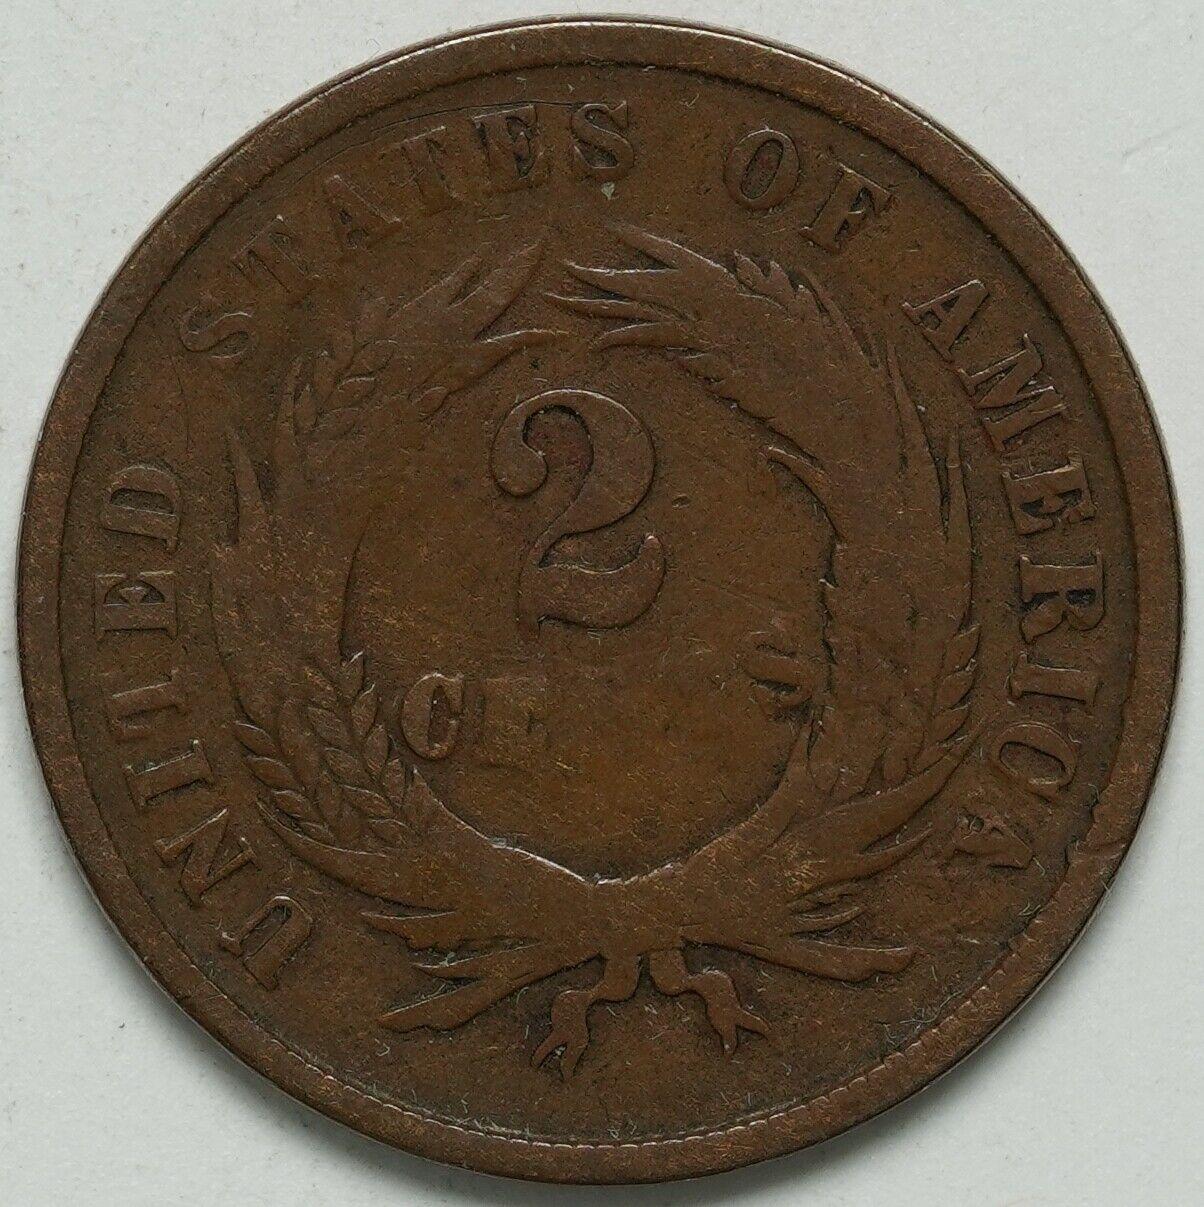 1865 2 Cent Piece - $29.99